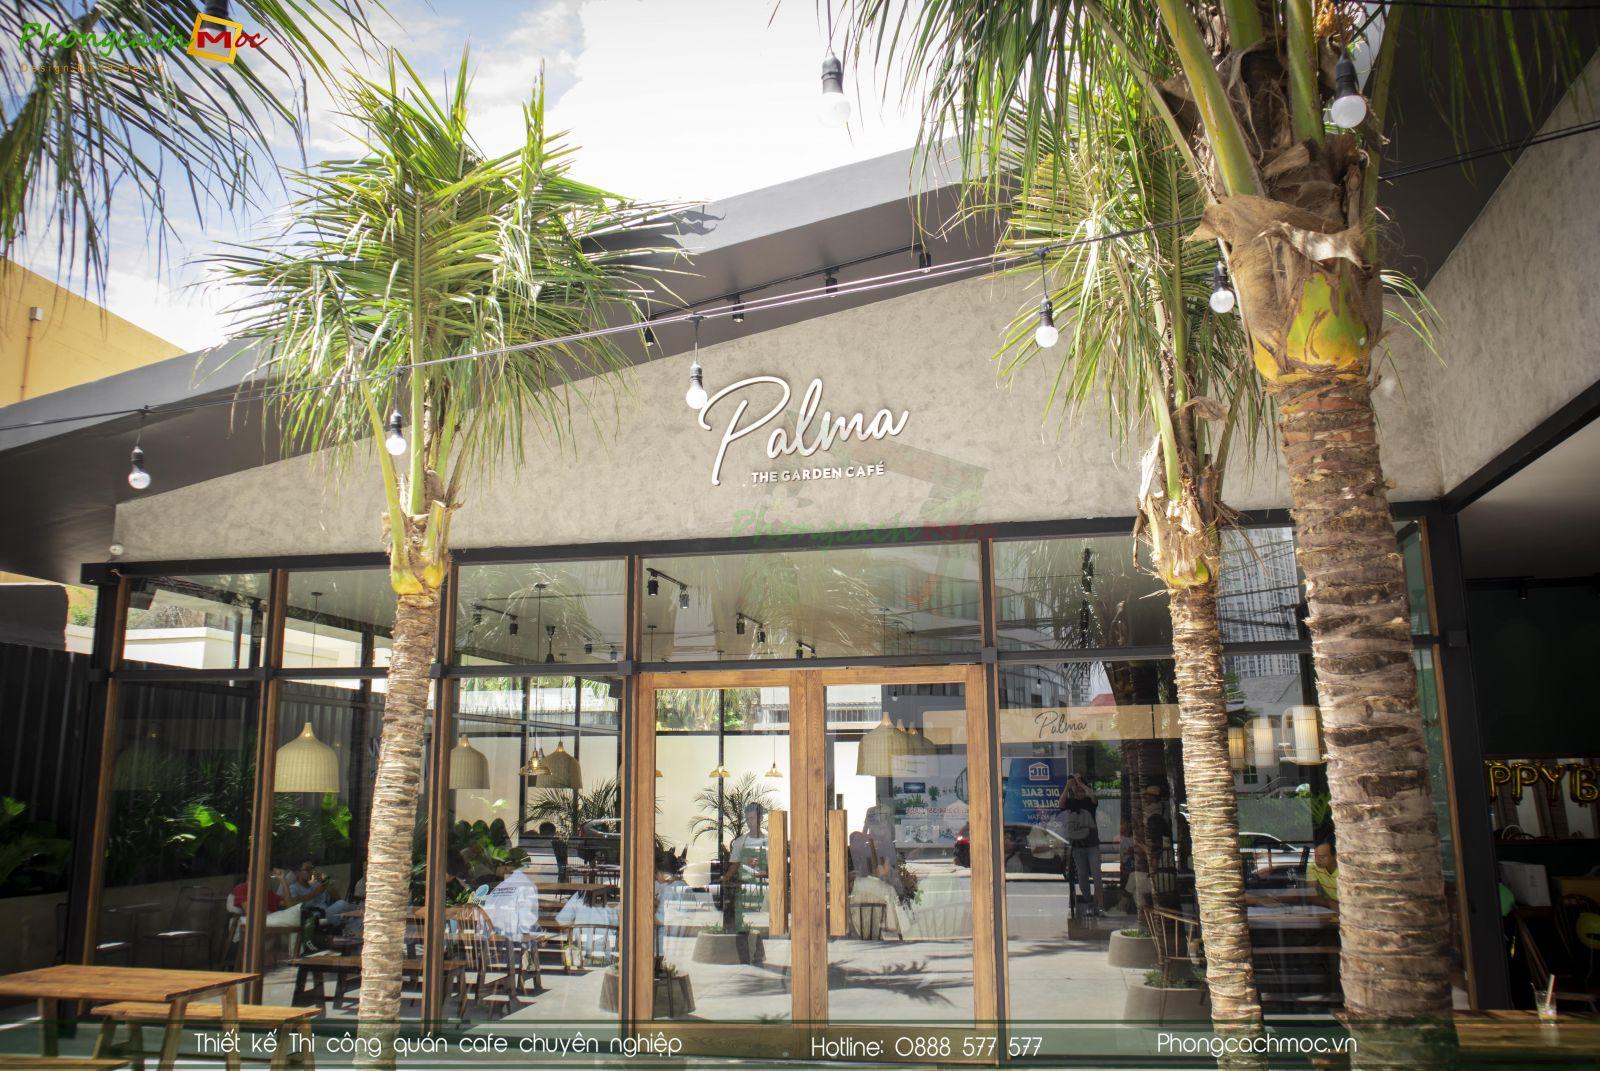 thi-cong-quan-cafe-palma-the-garden-cafe-vung-tau-12